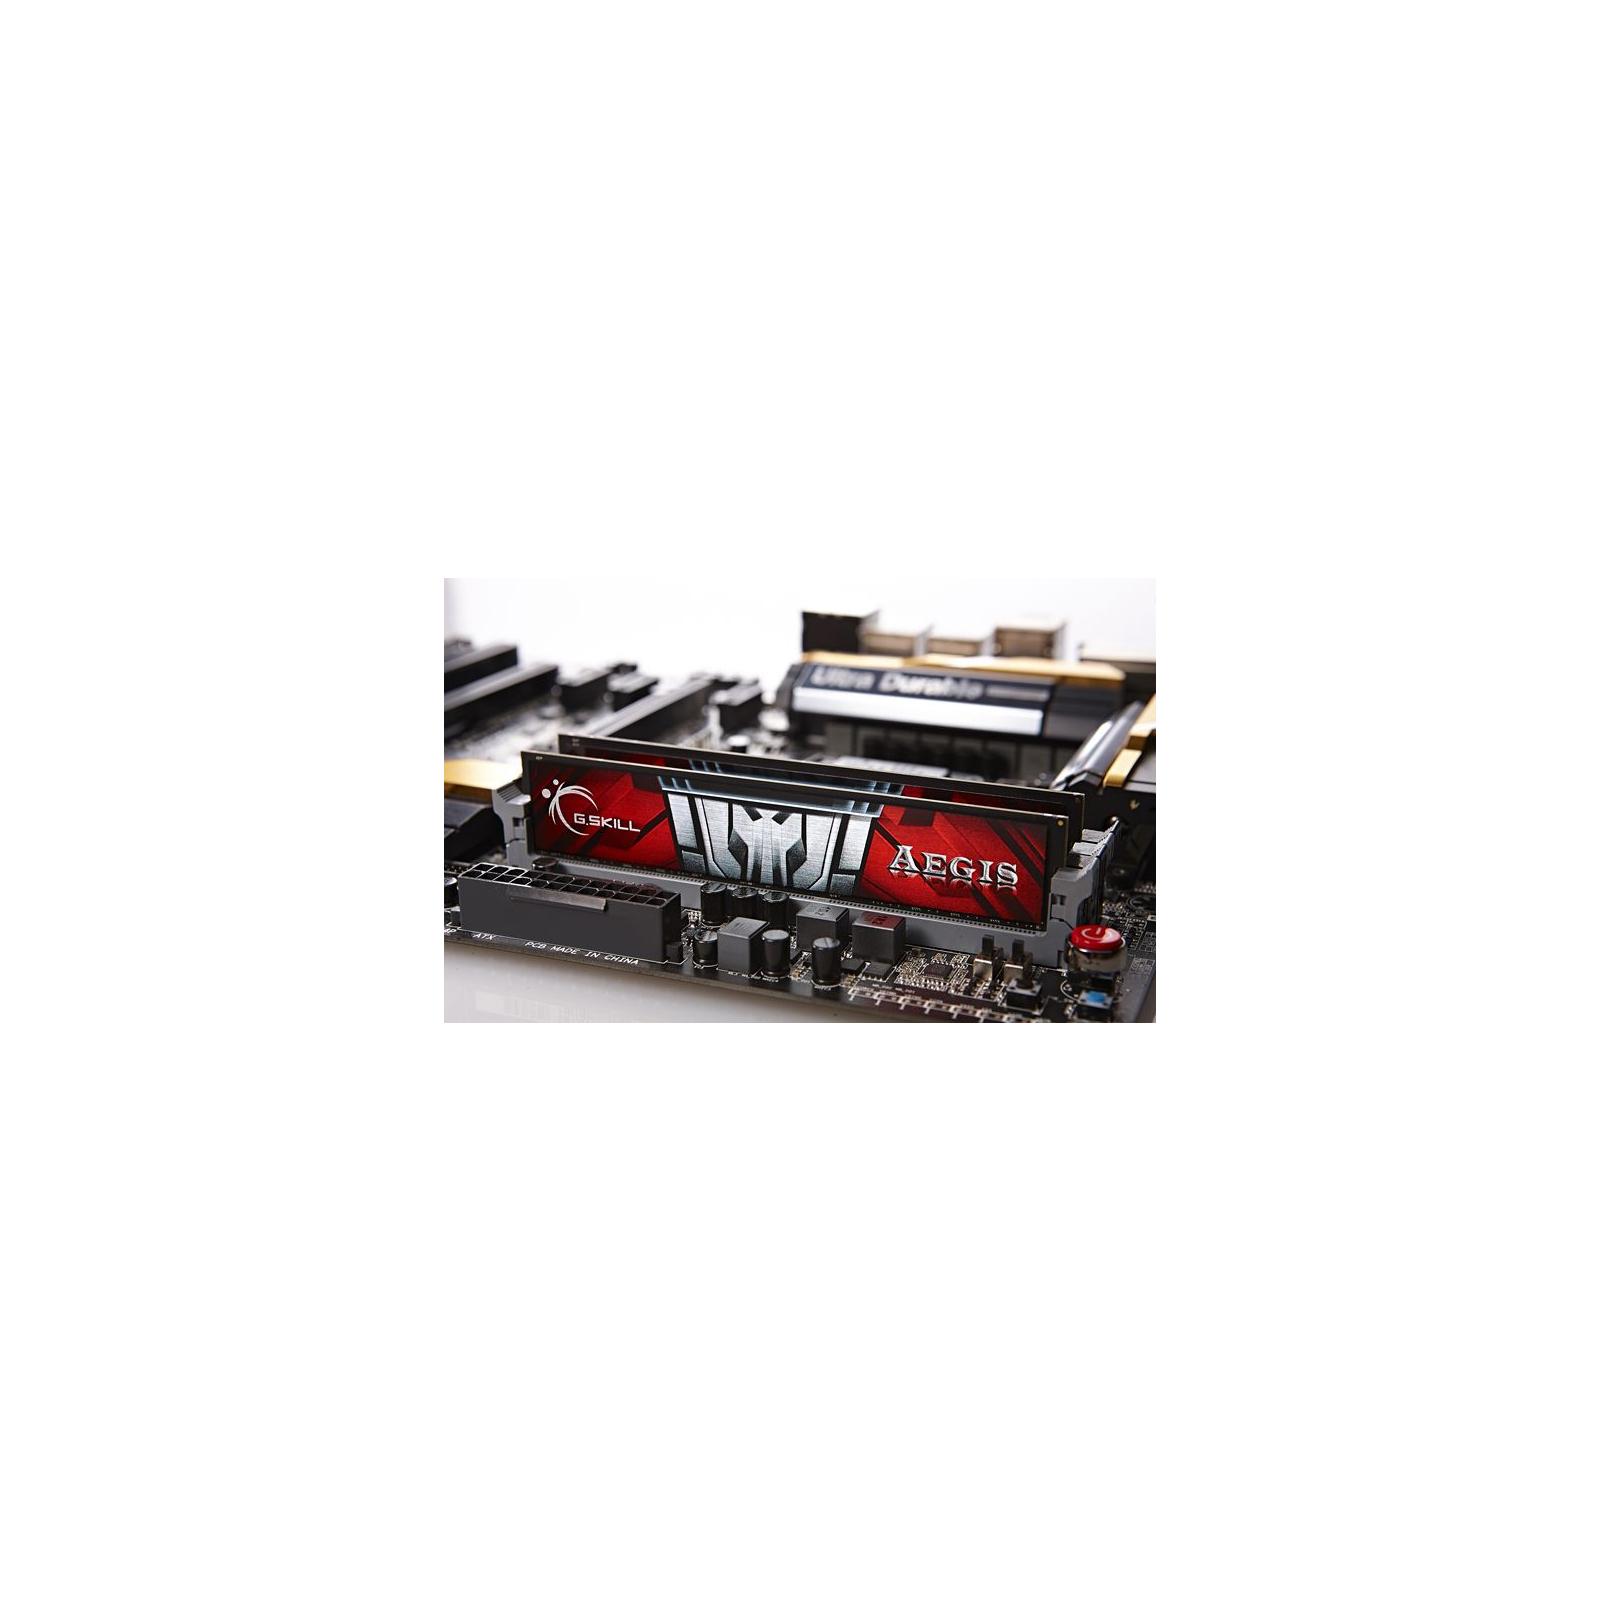 Модуль памяти для компьютера DDR3 4GB 1333 MHz G.Skill (F3-1333C9S-4GIS) изображение 2